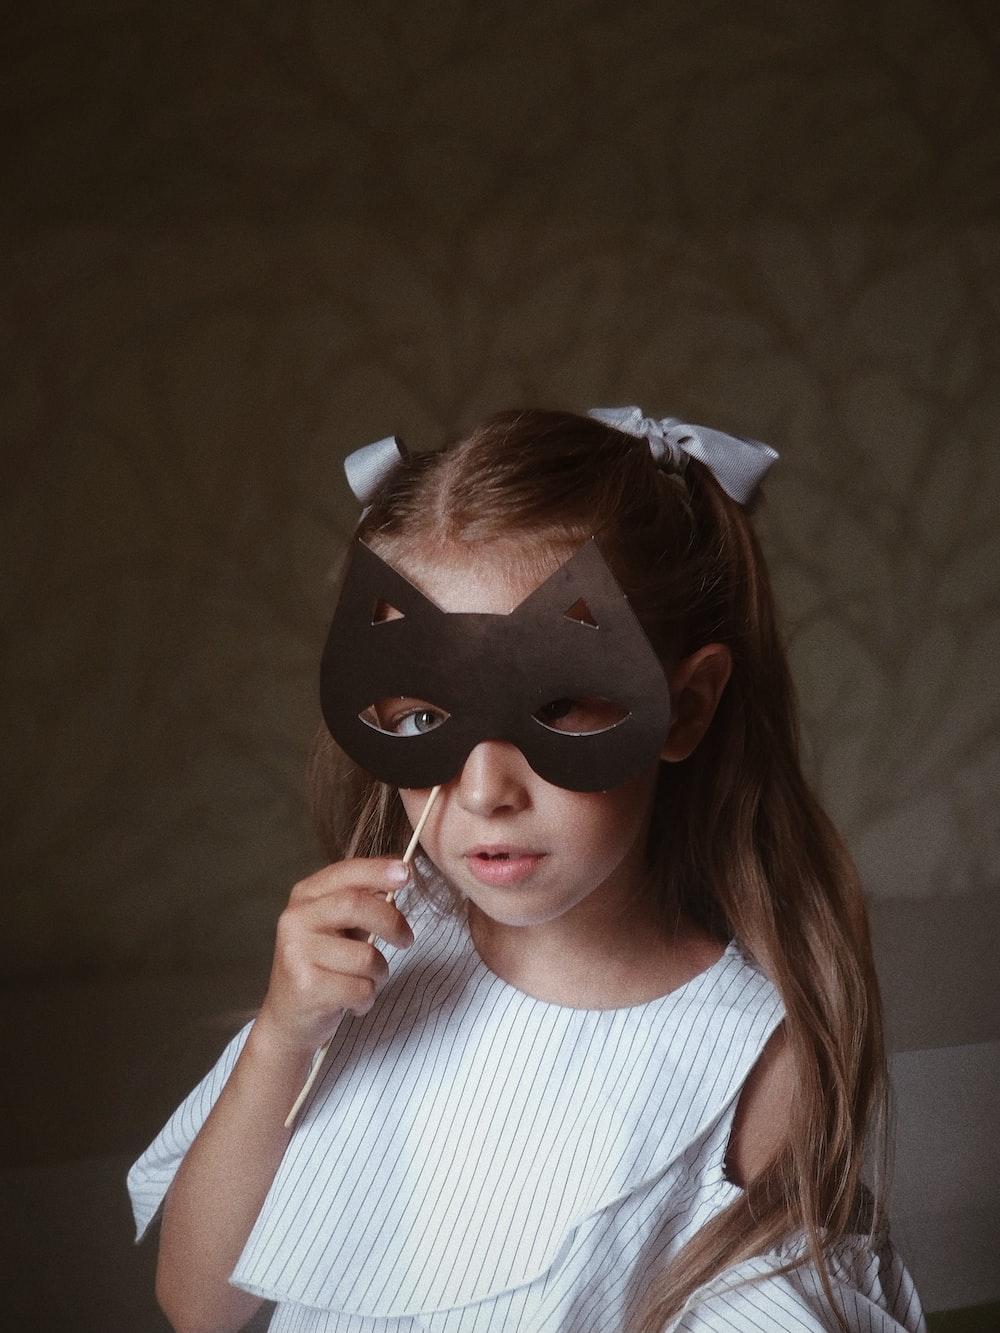 woman holding black eye mask